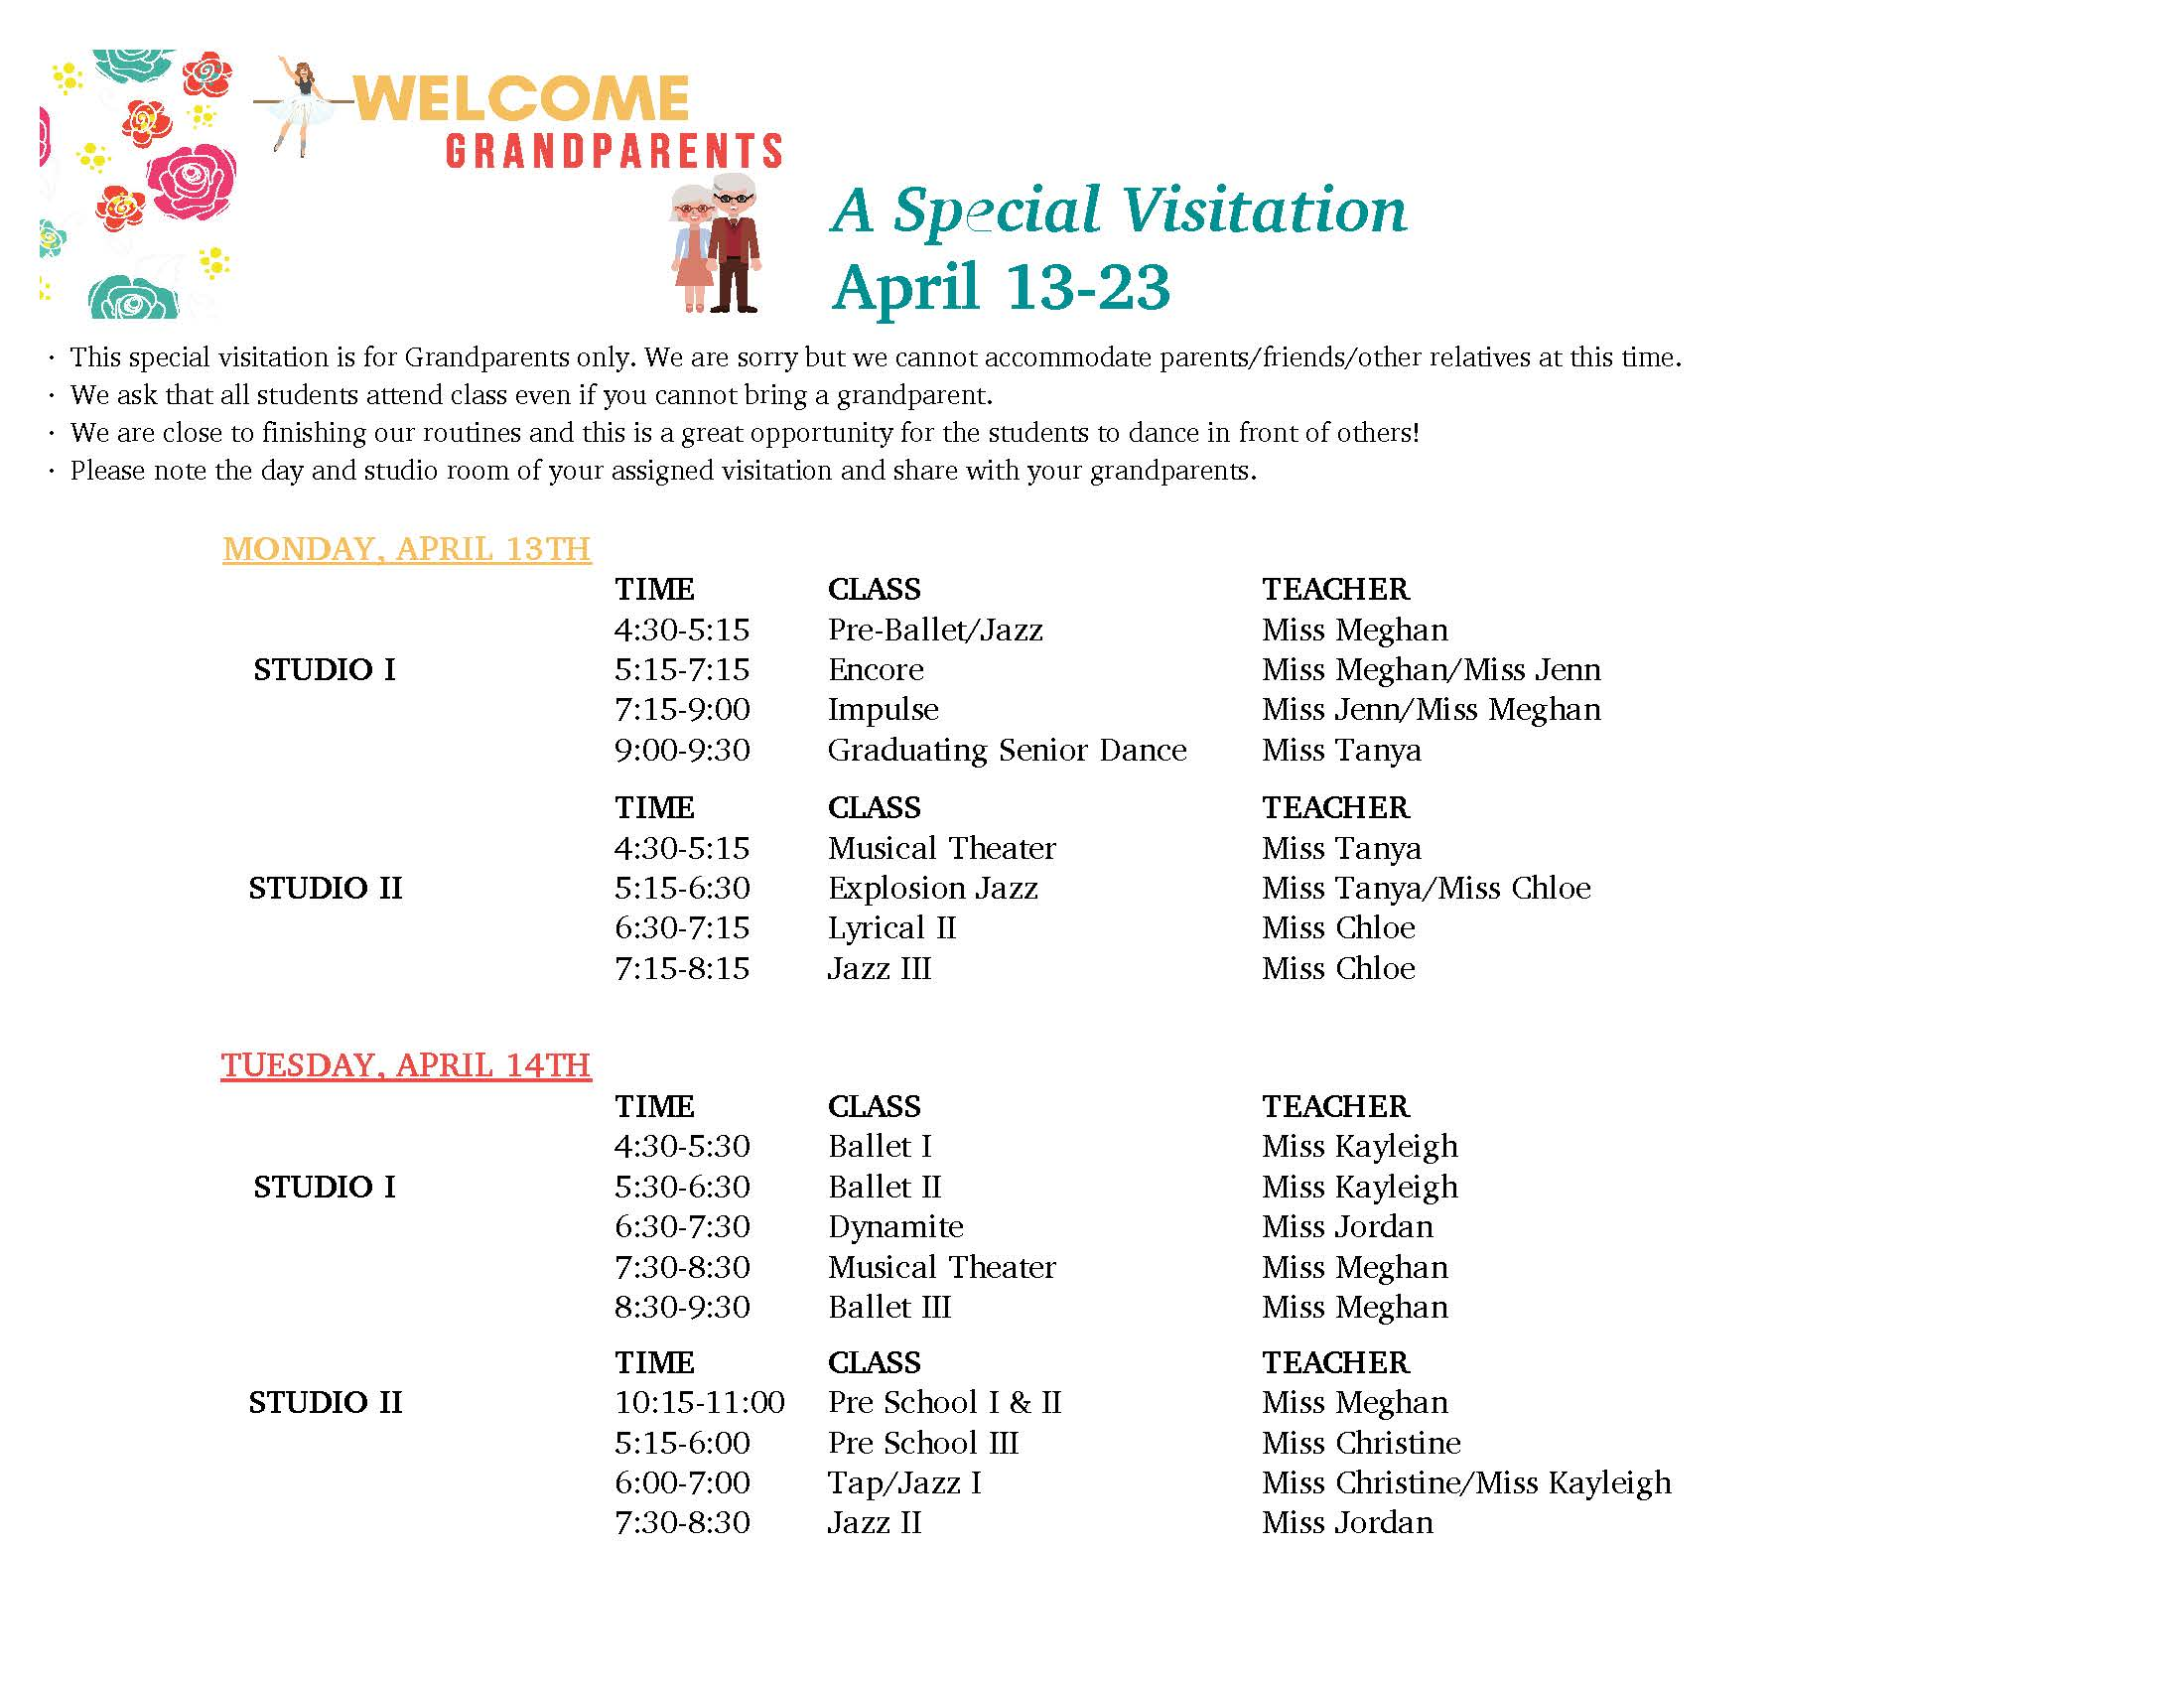 2020 Grandparent Visitation Schedule-1_Page_1